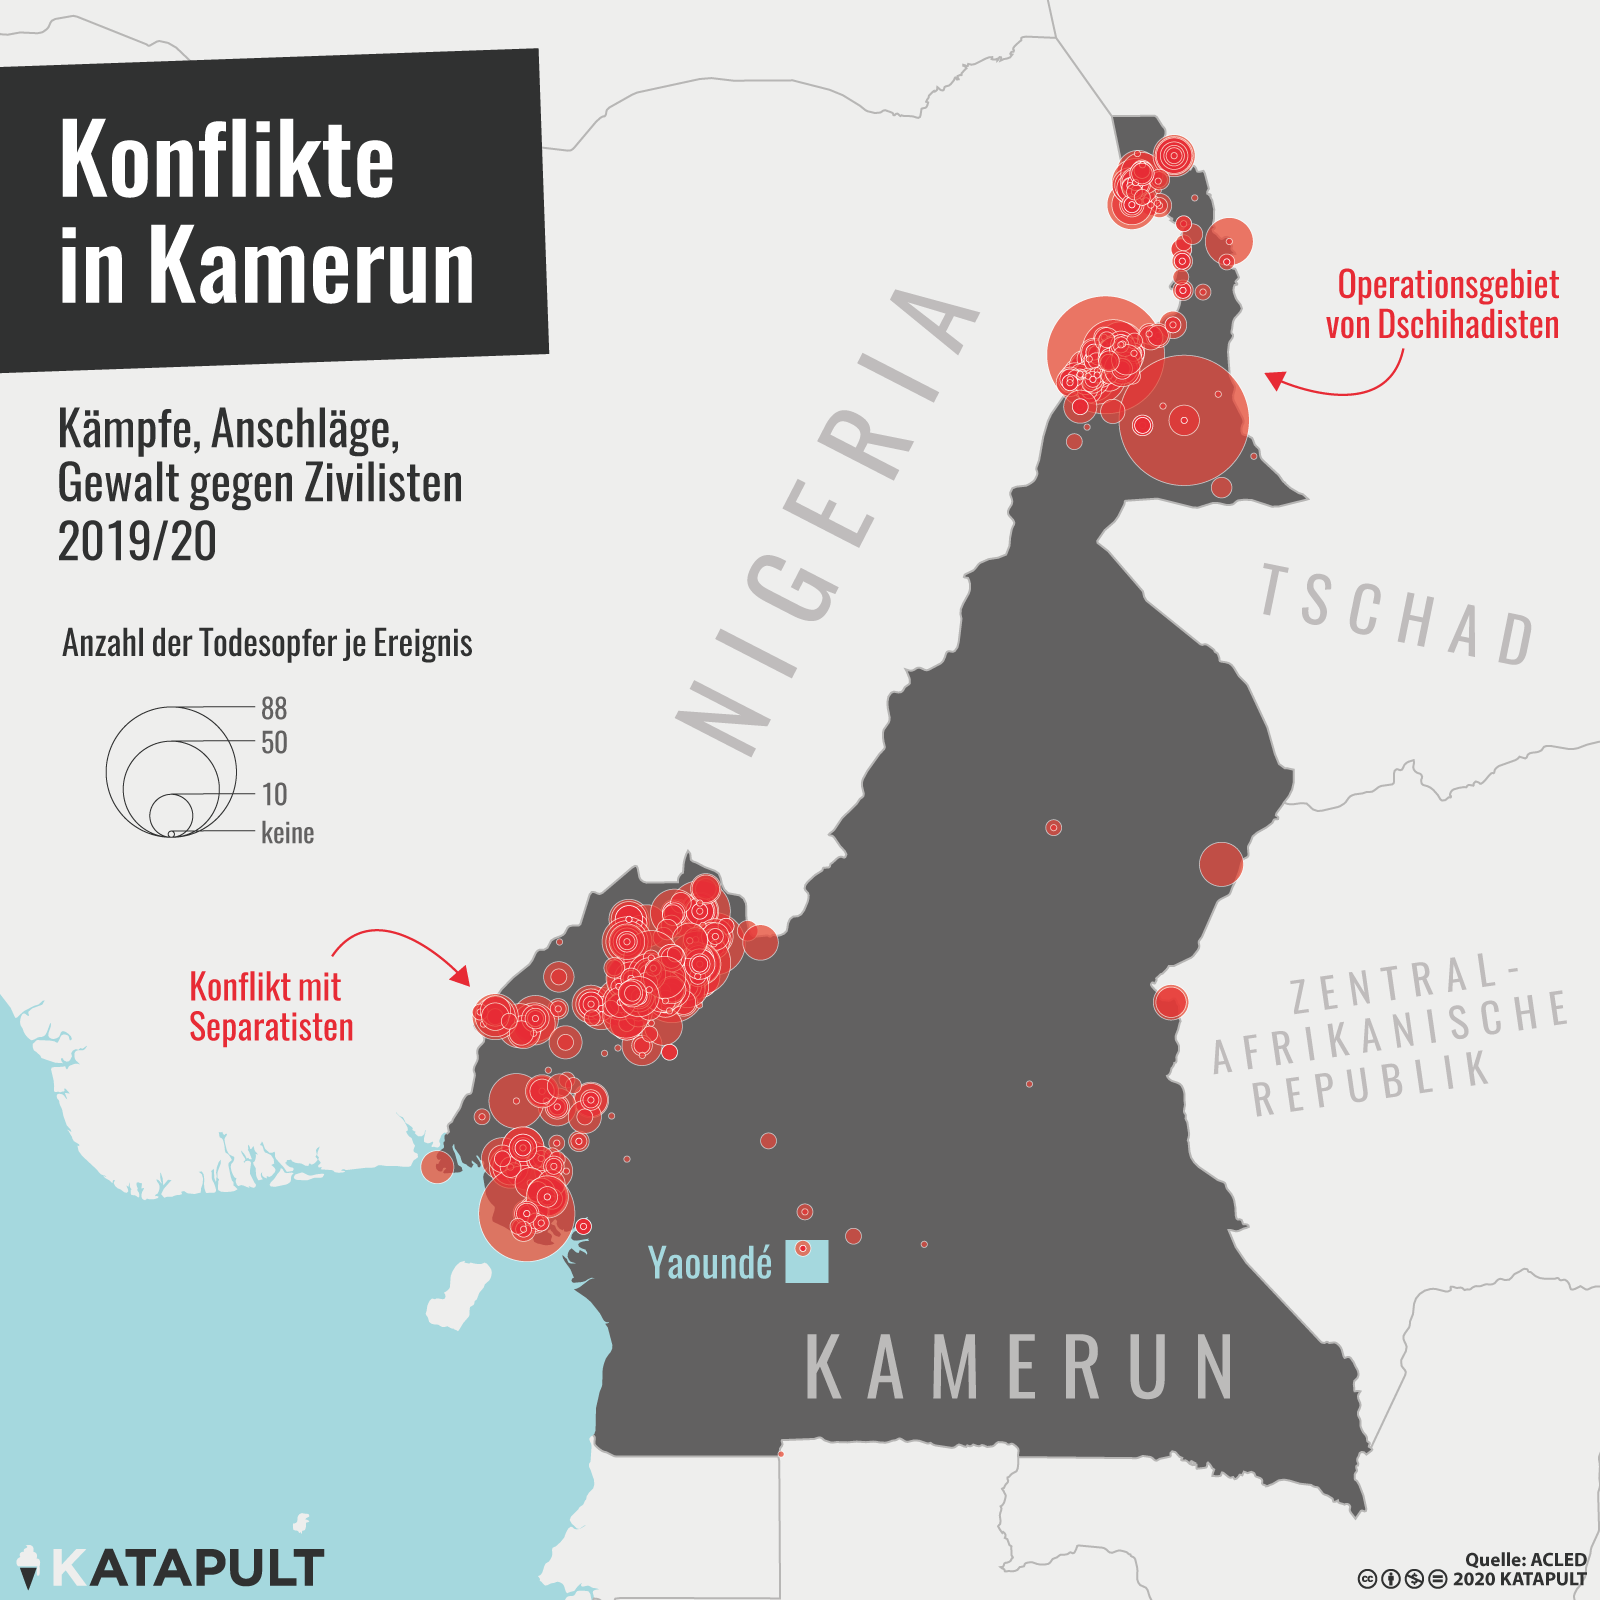 KATAPULT - Der ignorierte Konflikt